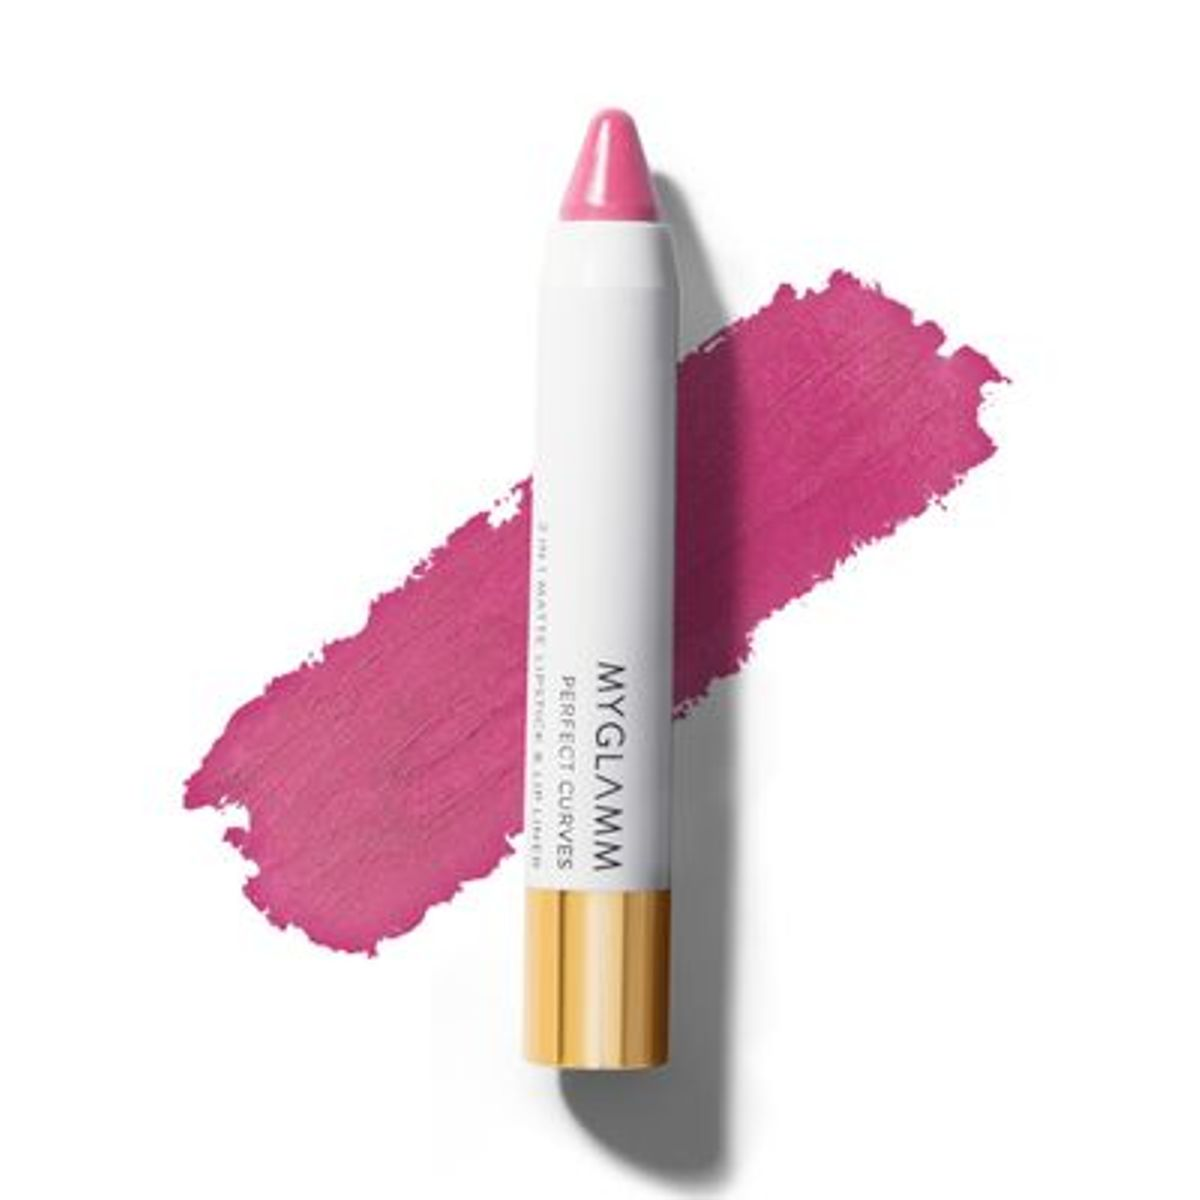 Perfect Curves - Moisturising Pink Matte Lipstick